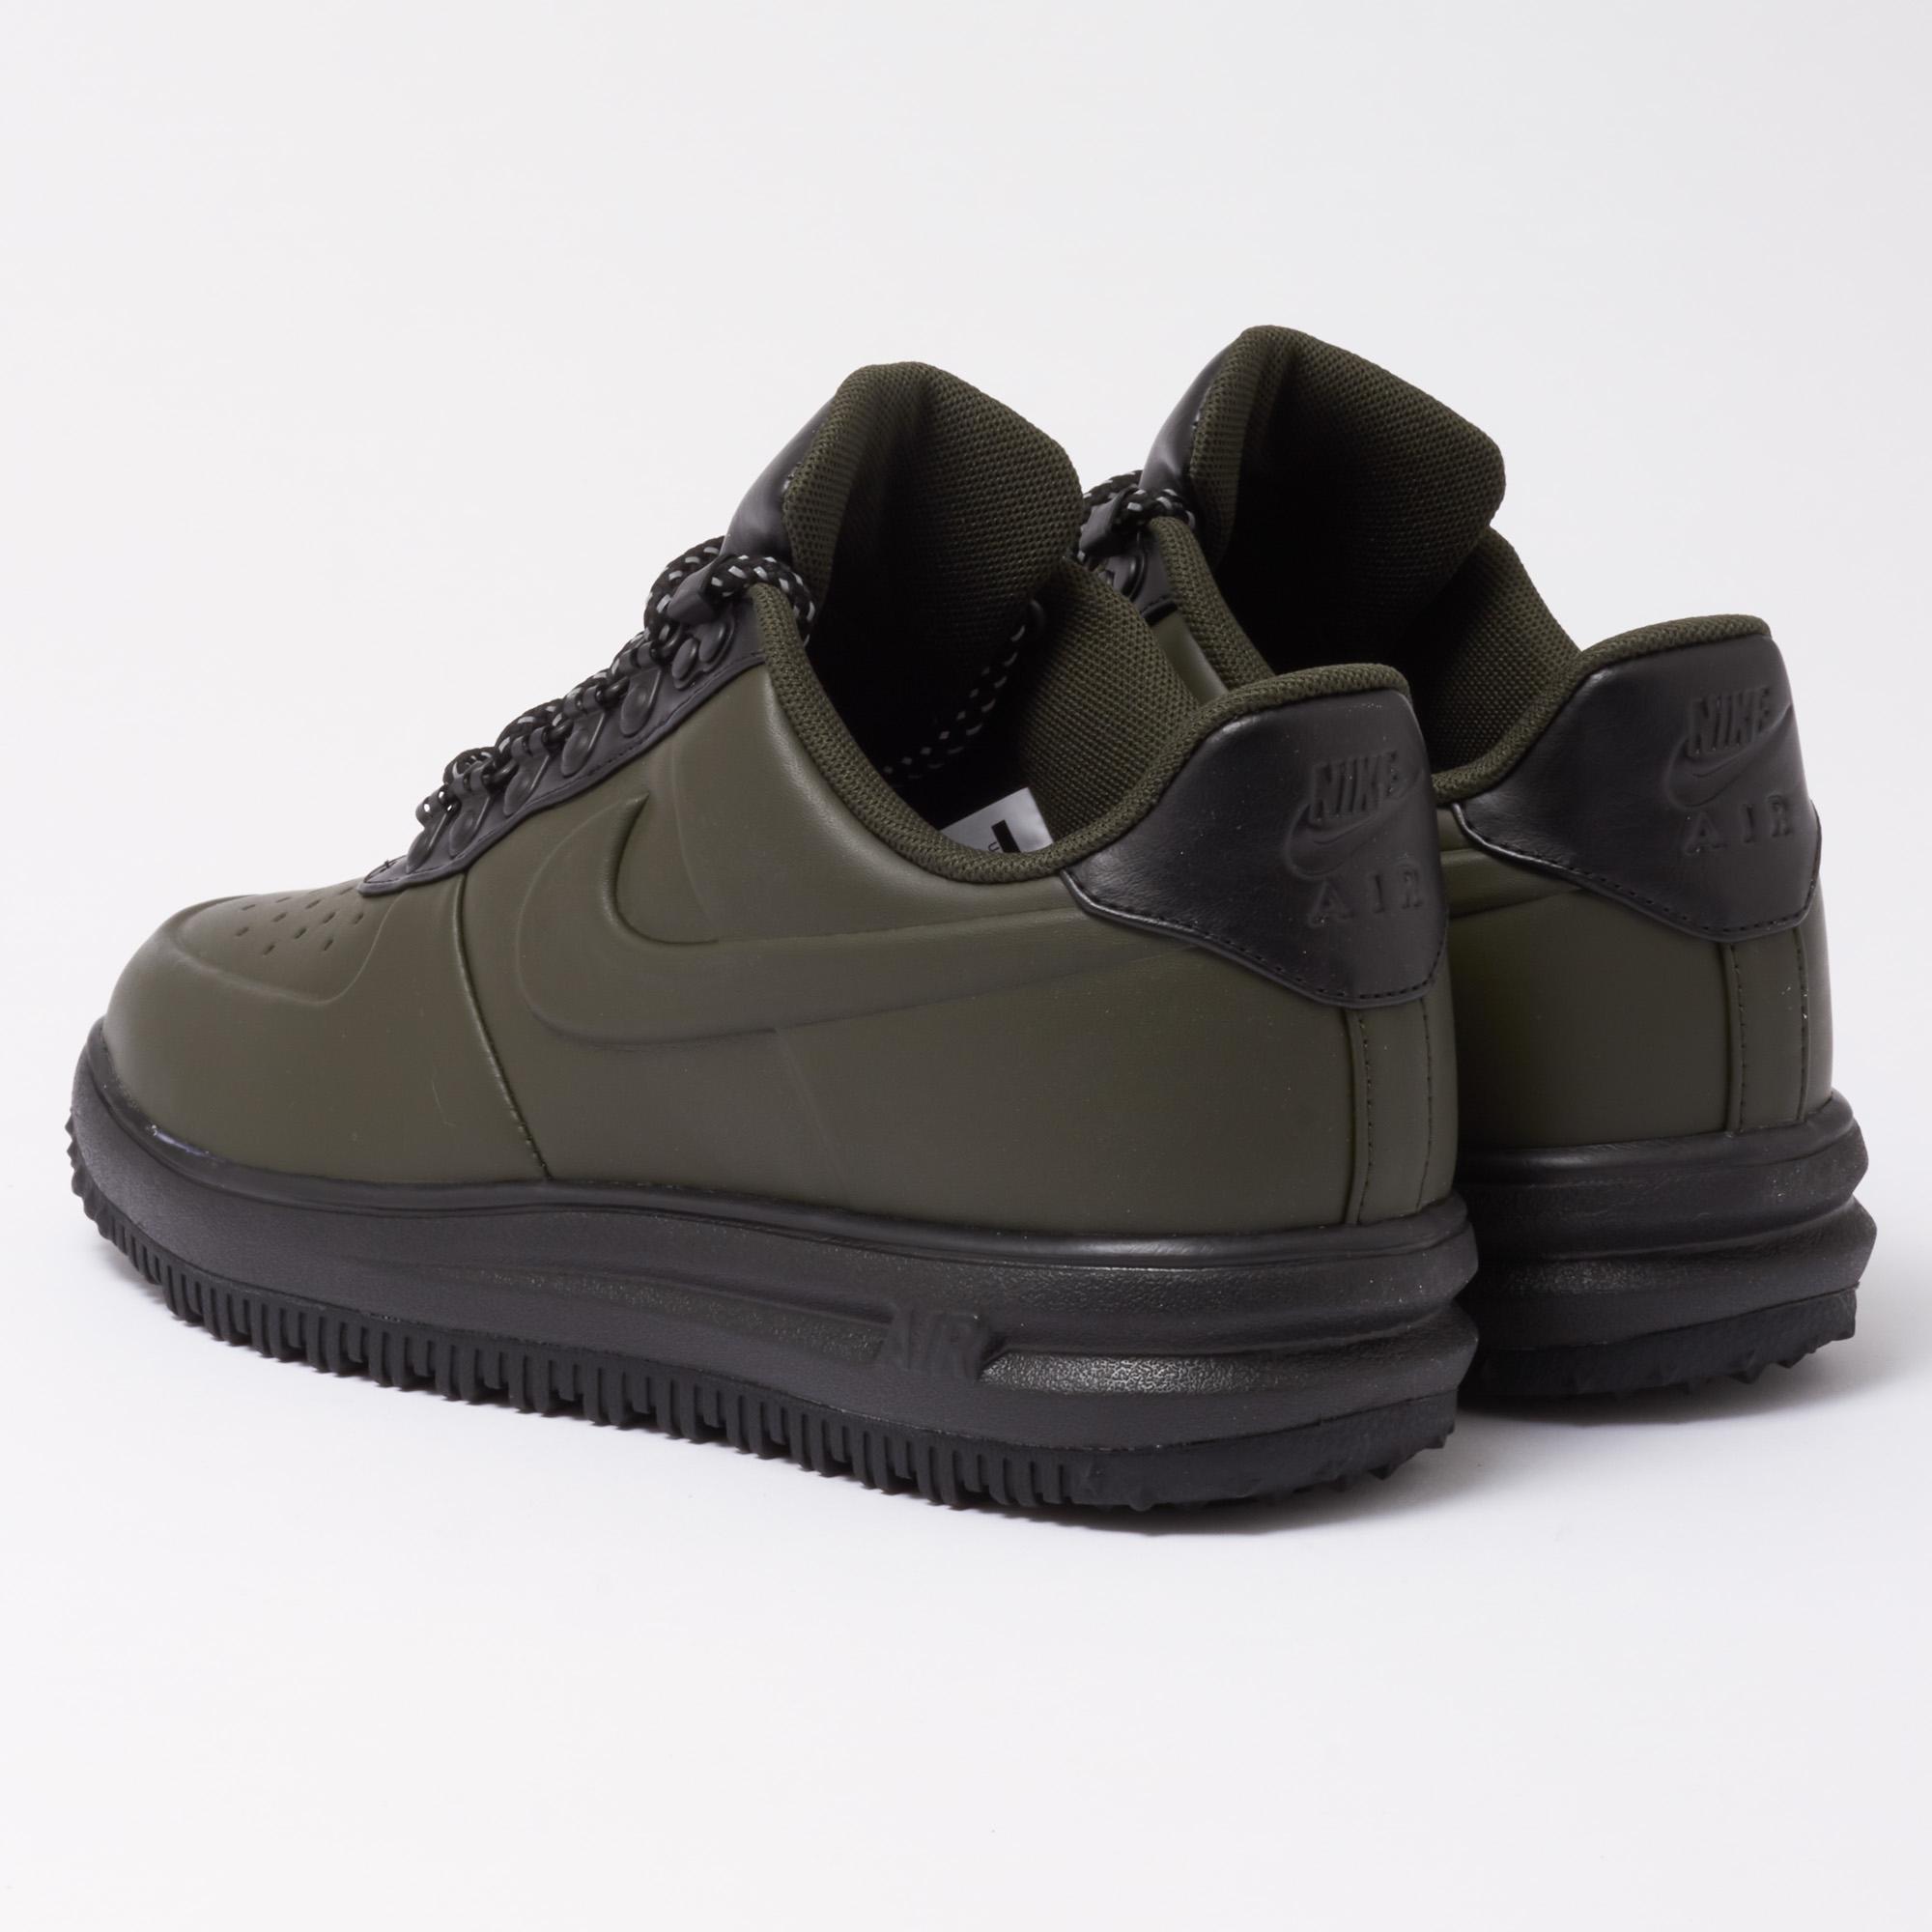 cb061b9f96e465 Lyst - Nike Lunar Force 1 Duckboot Low - Sequoia in Black for Men